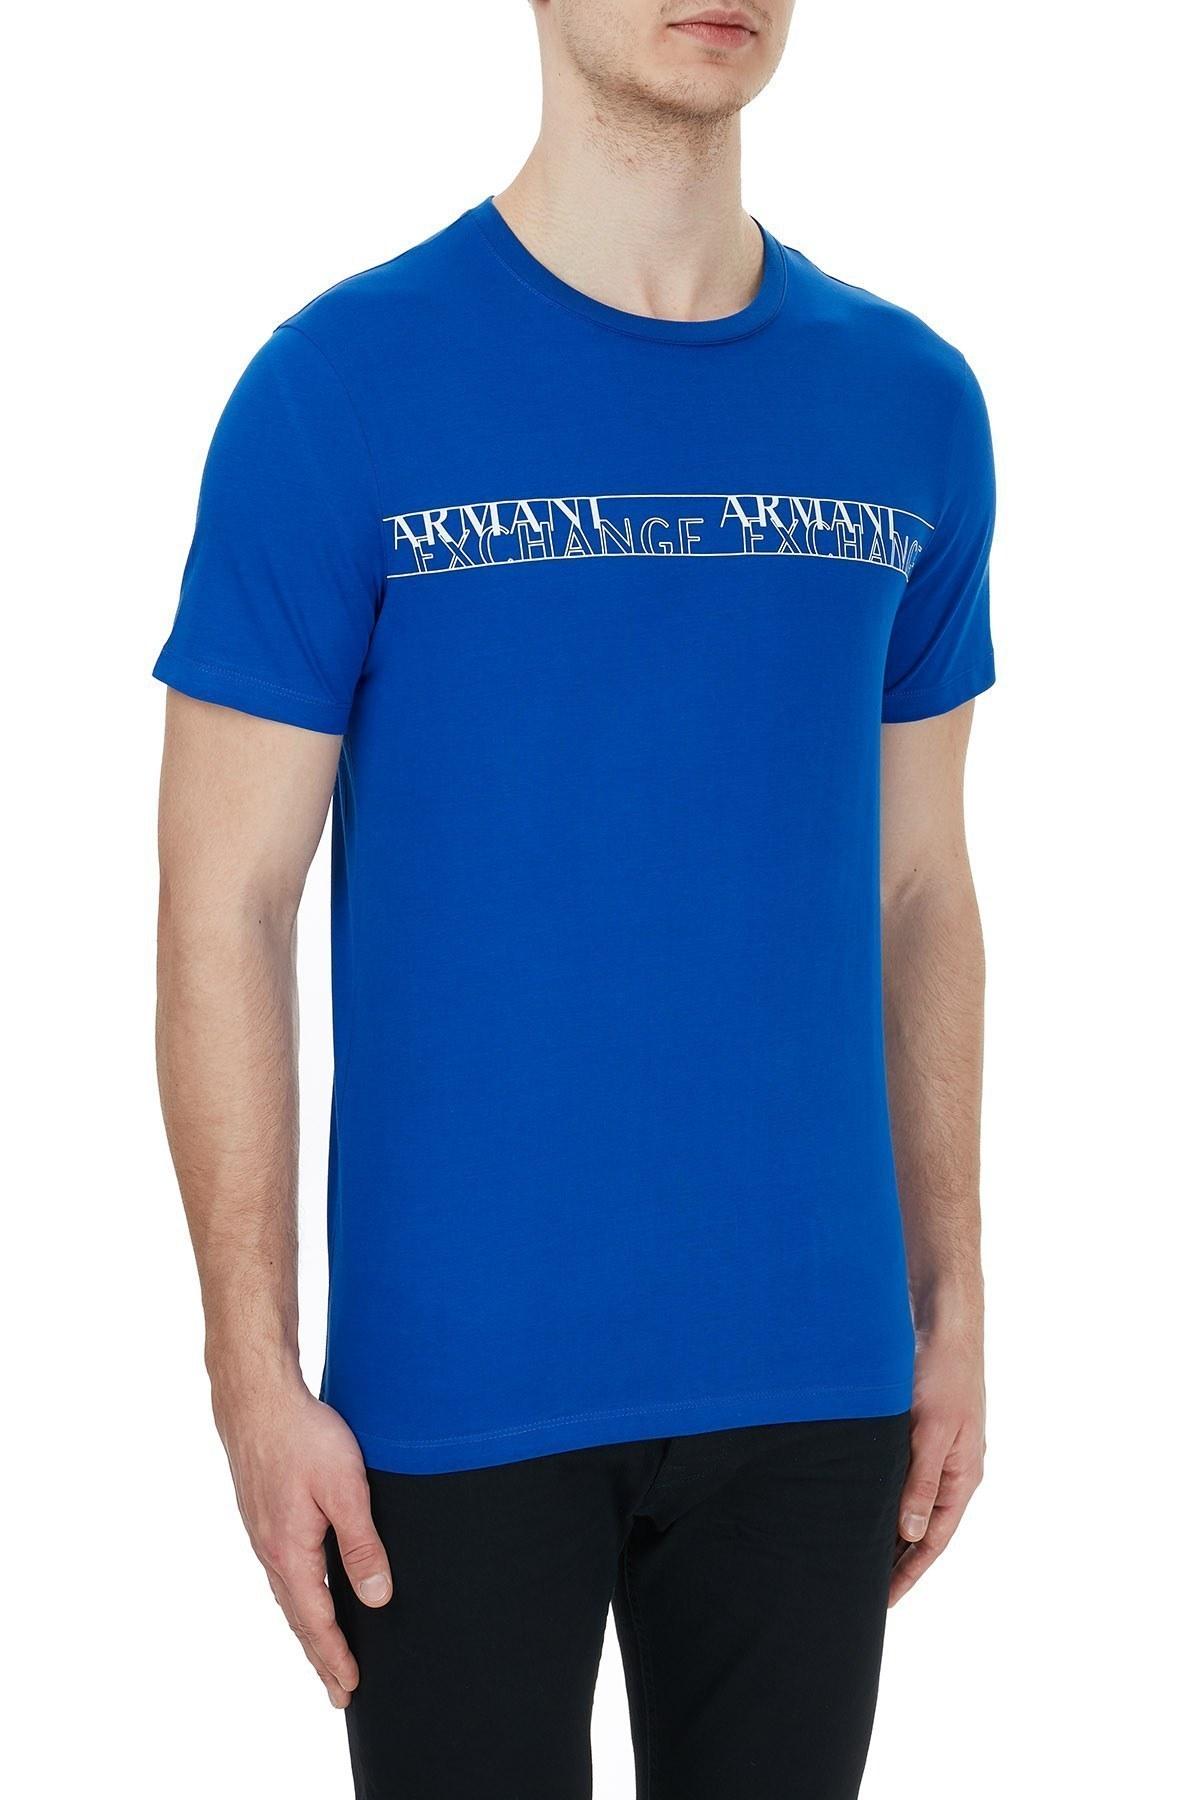 Armani Exchange % 100 Pamuklu Baskılı Bisiklet Yaka Erkek T Shirt 6HZTFC ZJBVZ 1506 SAKS